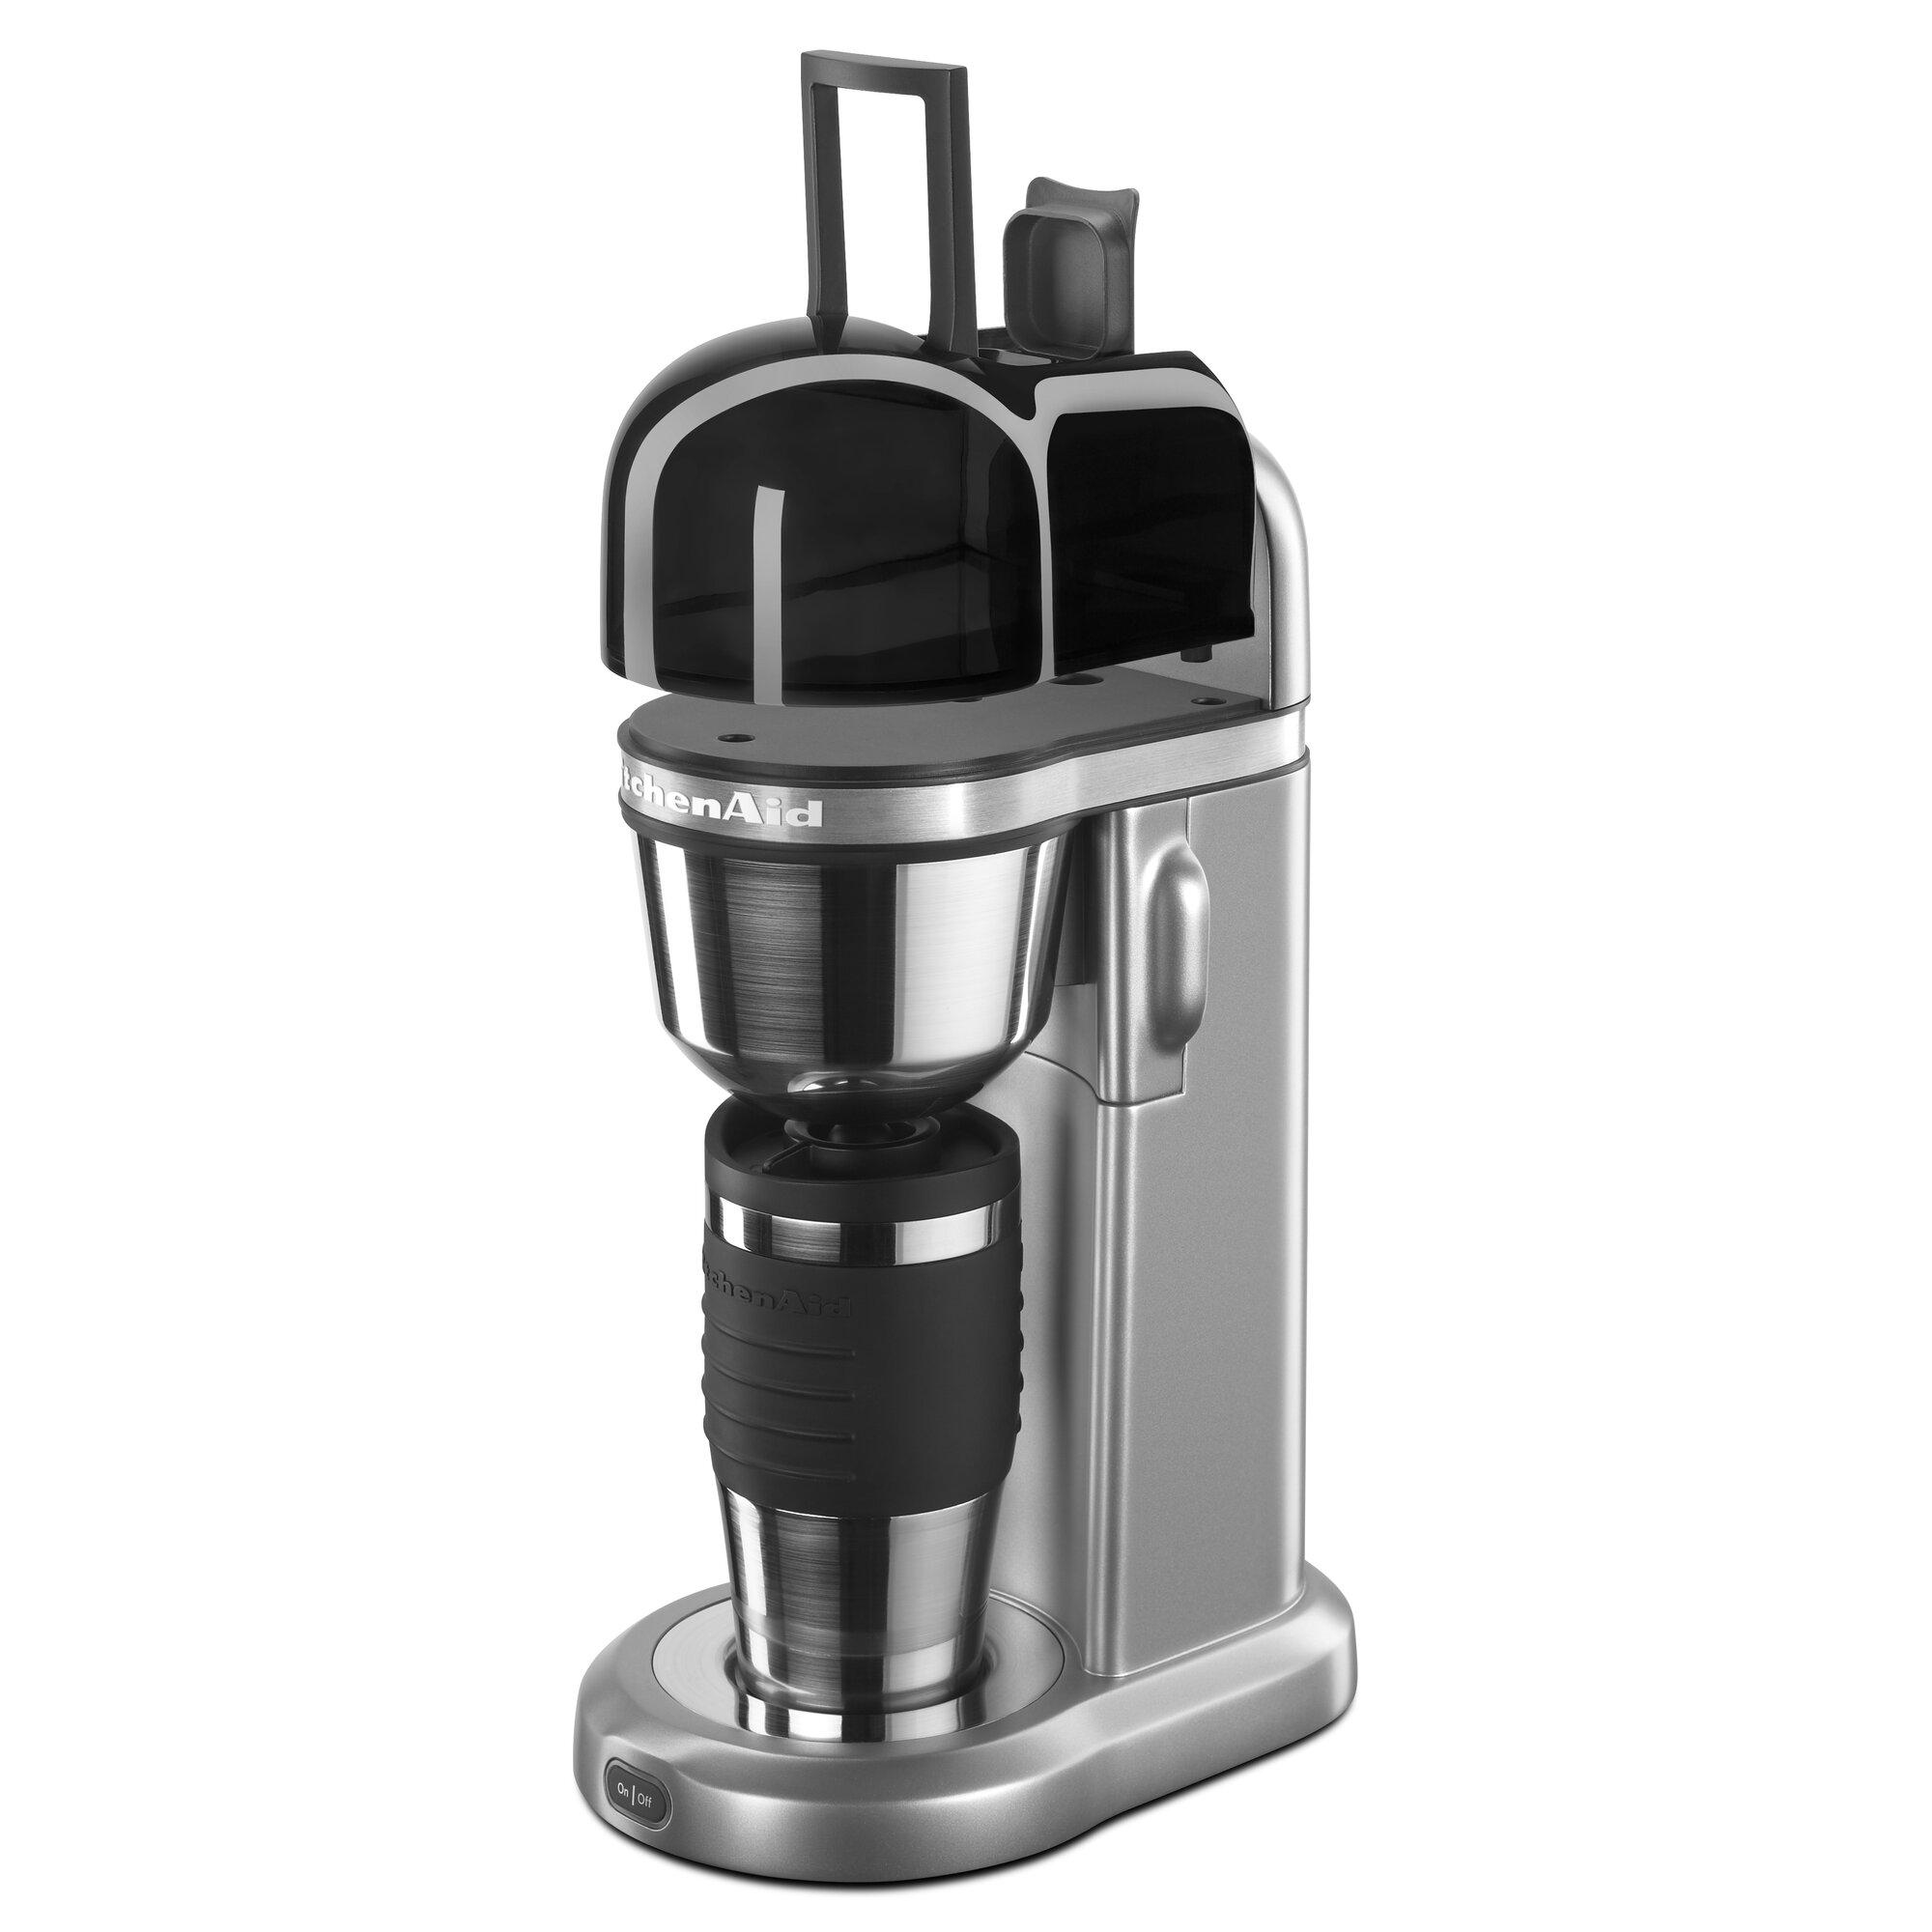 KitchenAid Personal 4 Cup Coffee Maker u0026 Reviews Wayfair